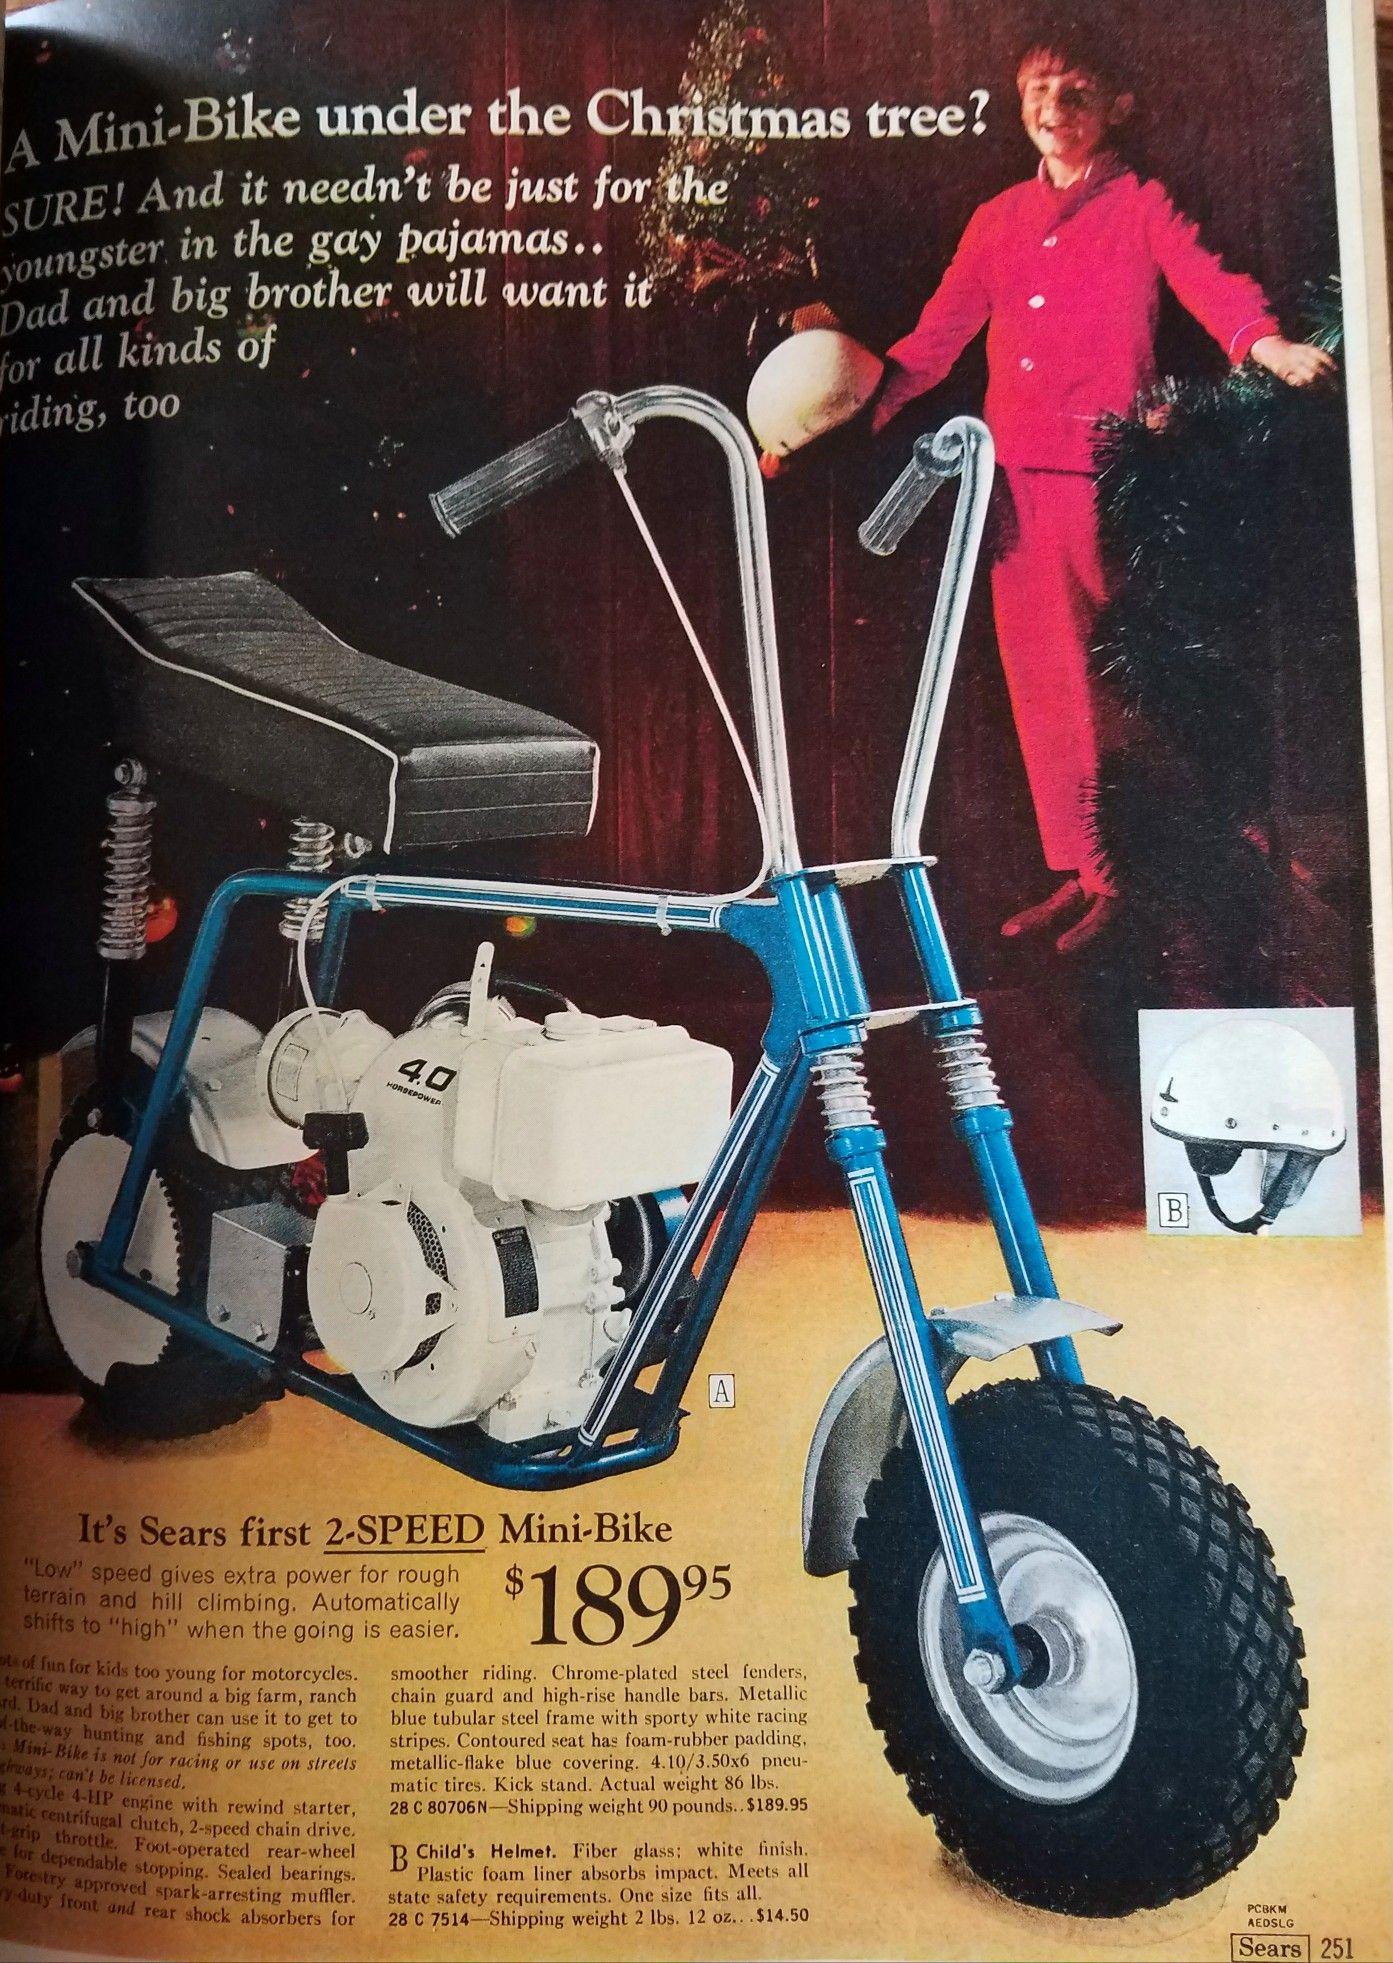 1972 ADVERT Golden Pinto Mini Bike 3.5 HP 4 Cycle Gas Gasoline Engine 23 MPG